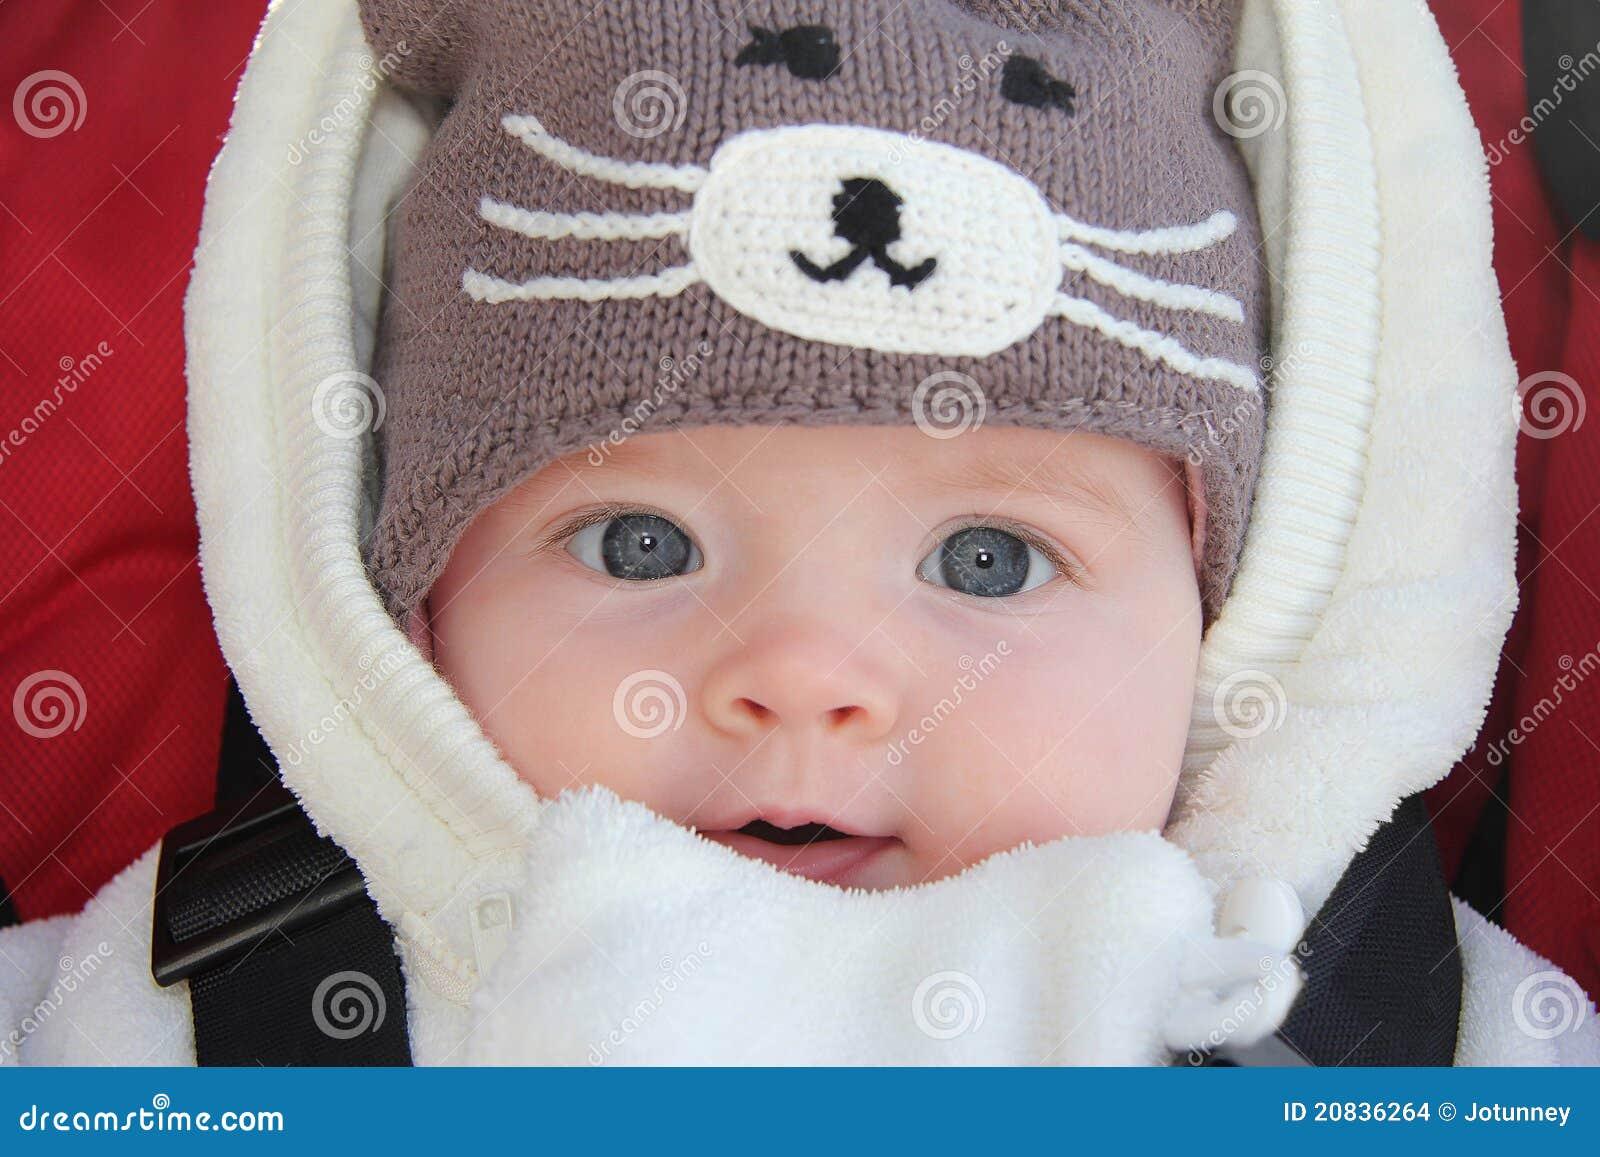 fun baby hats